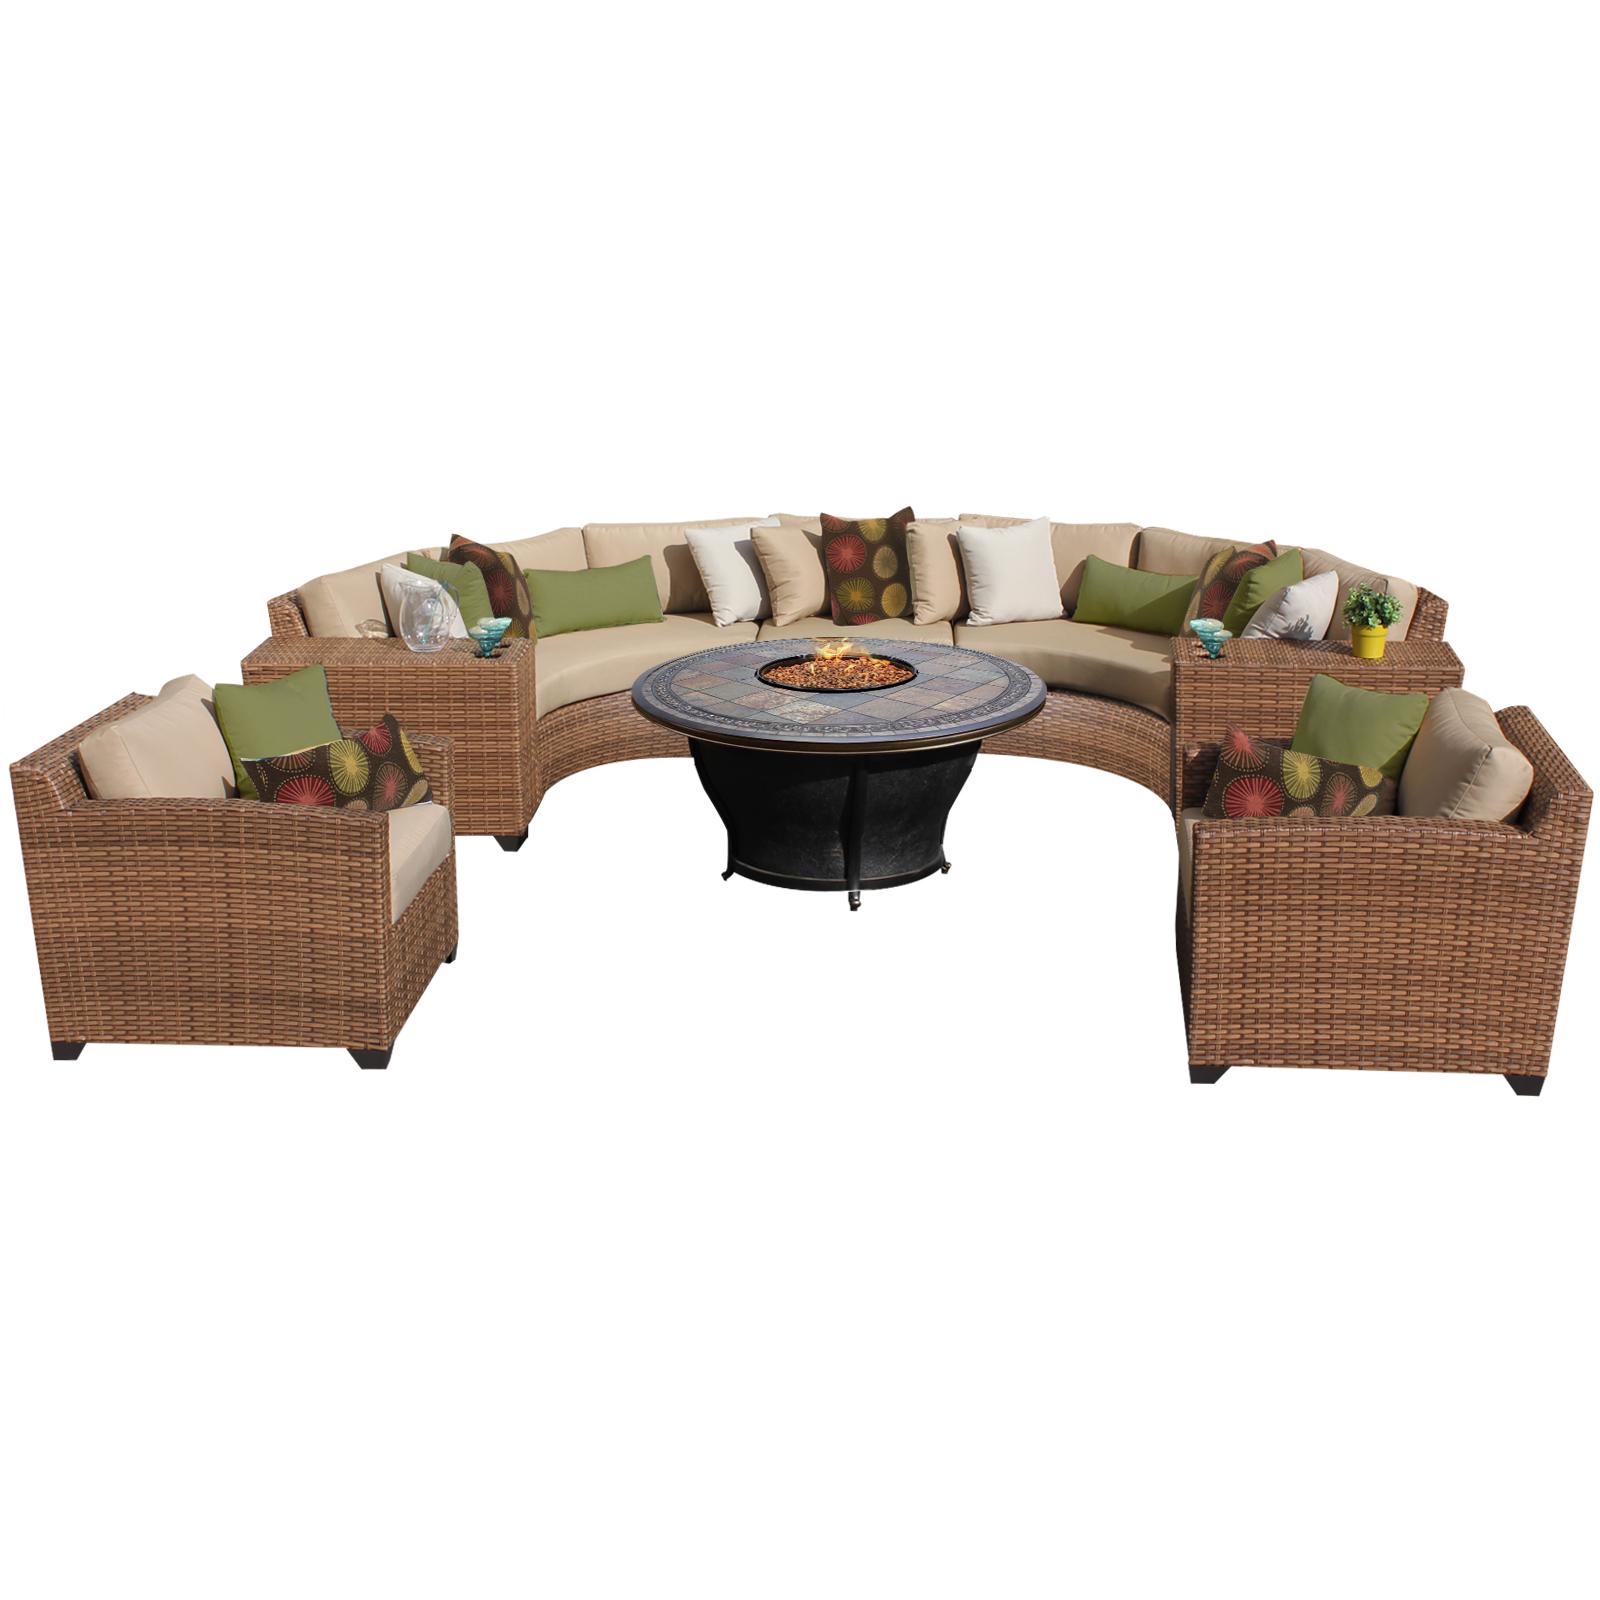 tuscan 8 piece outdoor wicker patio furniture set 08g - walmart